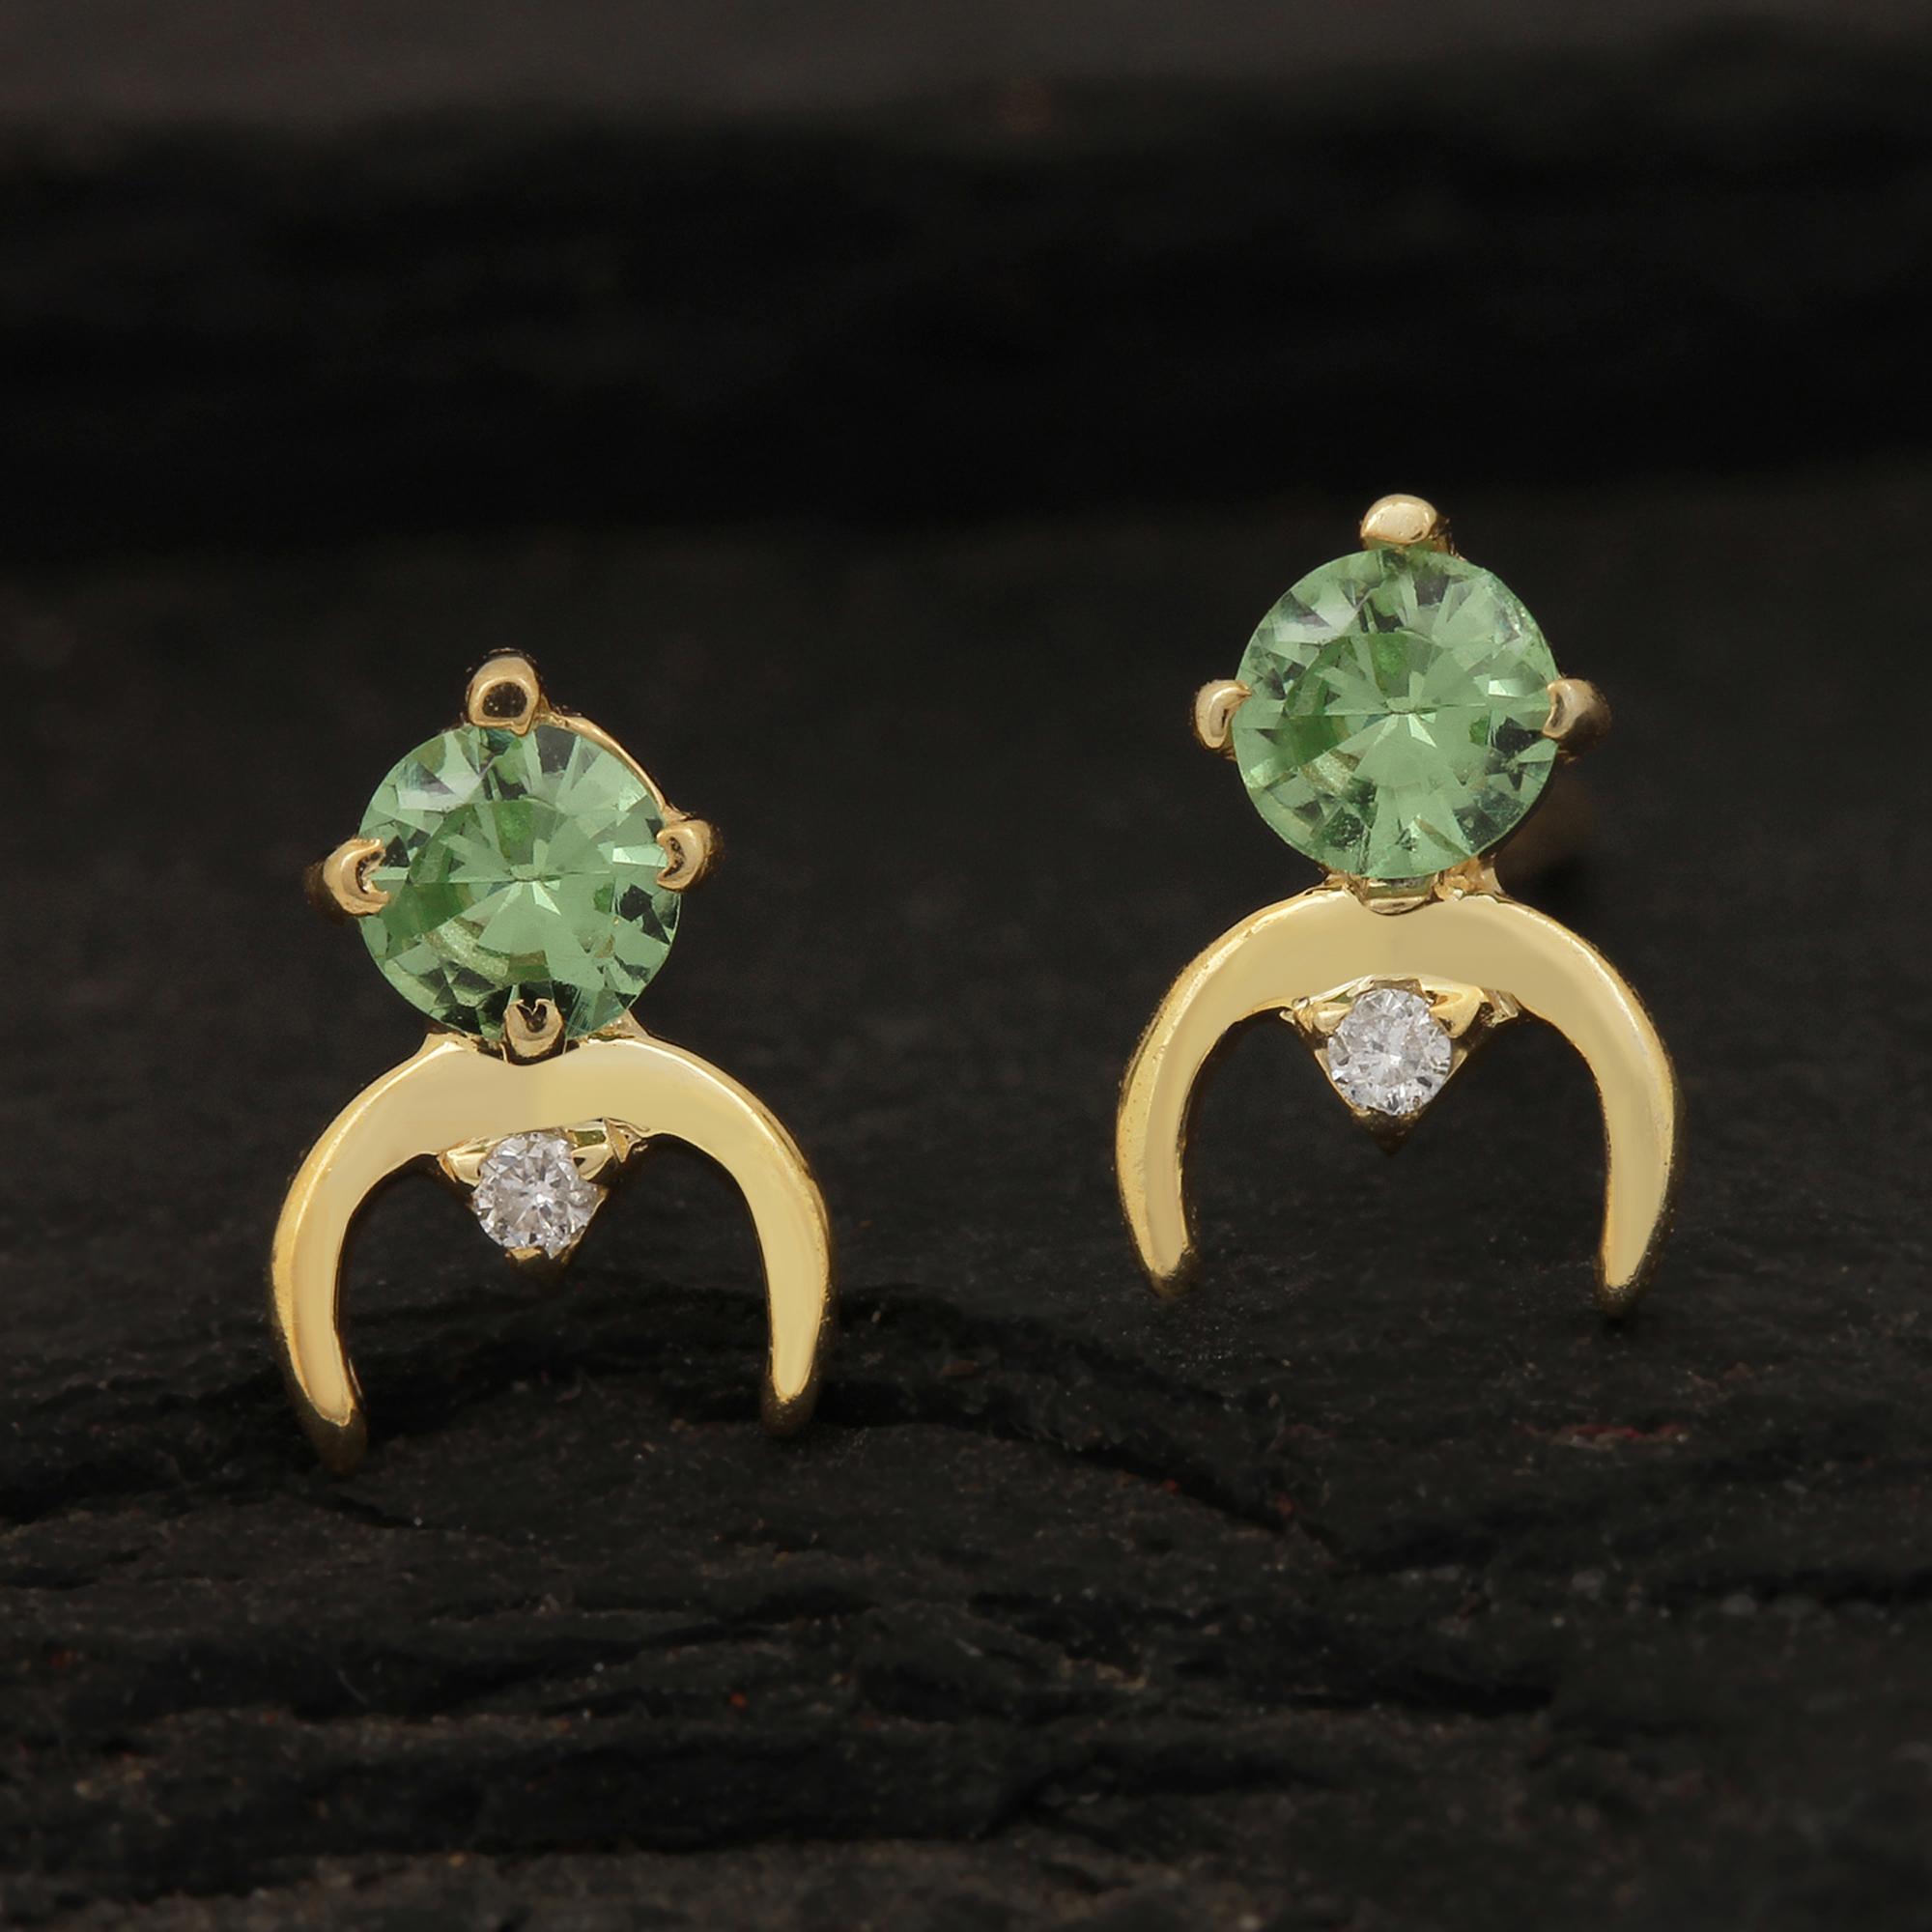 Natural Diamond 14k Solid Gold Tsavorite Solitaire Stud Earrings